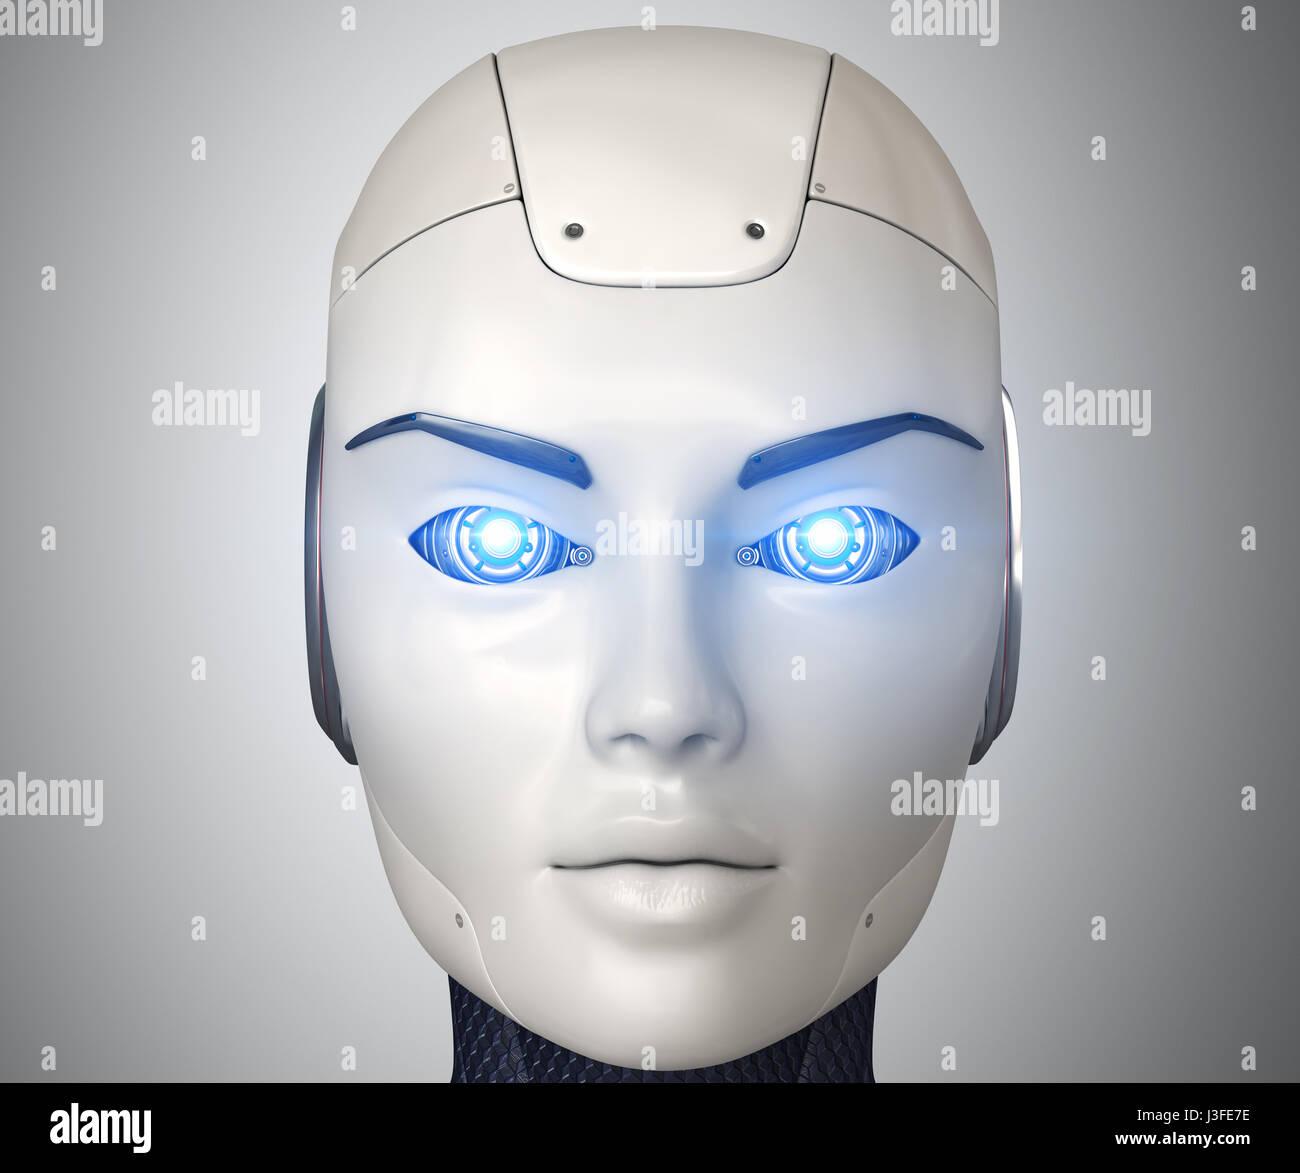 Robot's head close up,3D illustration Stock Photo